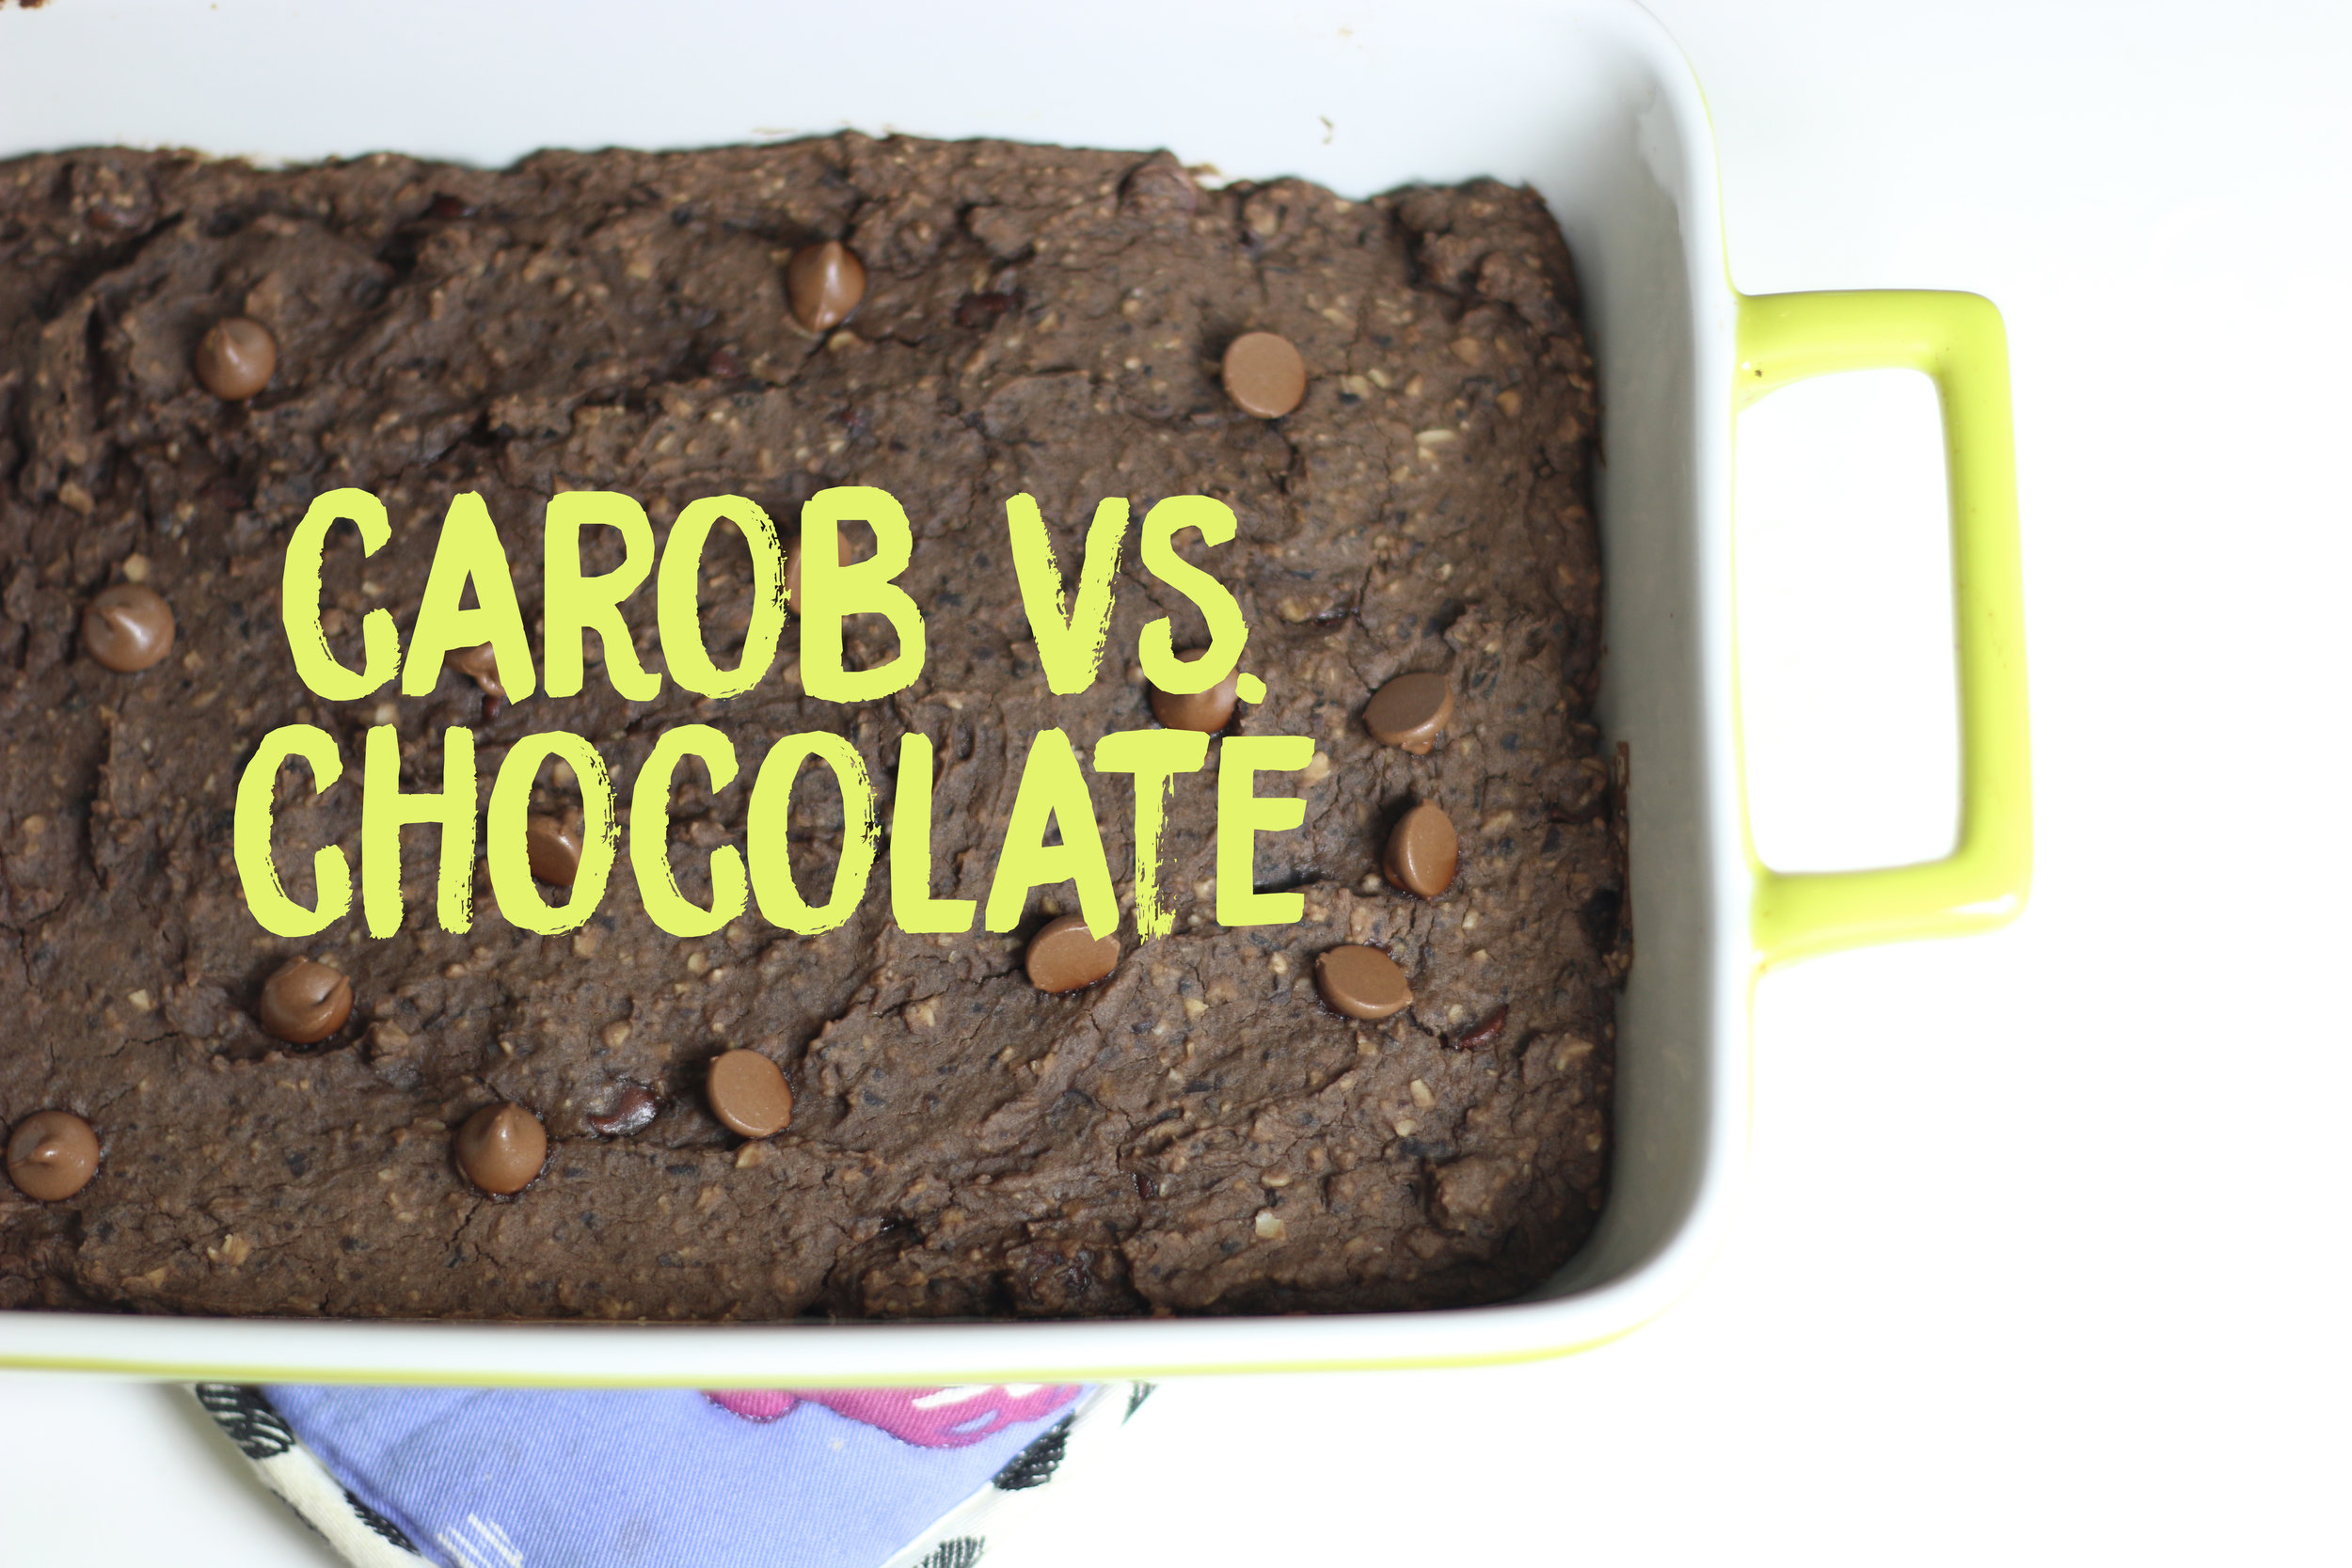 carobVs.chocolate